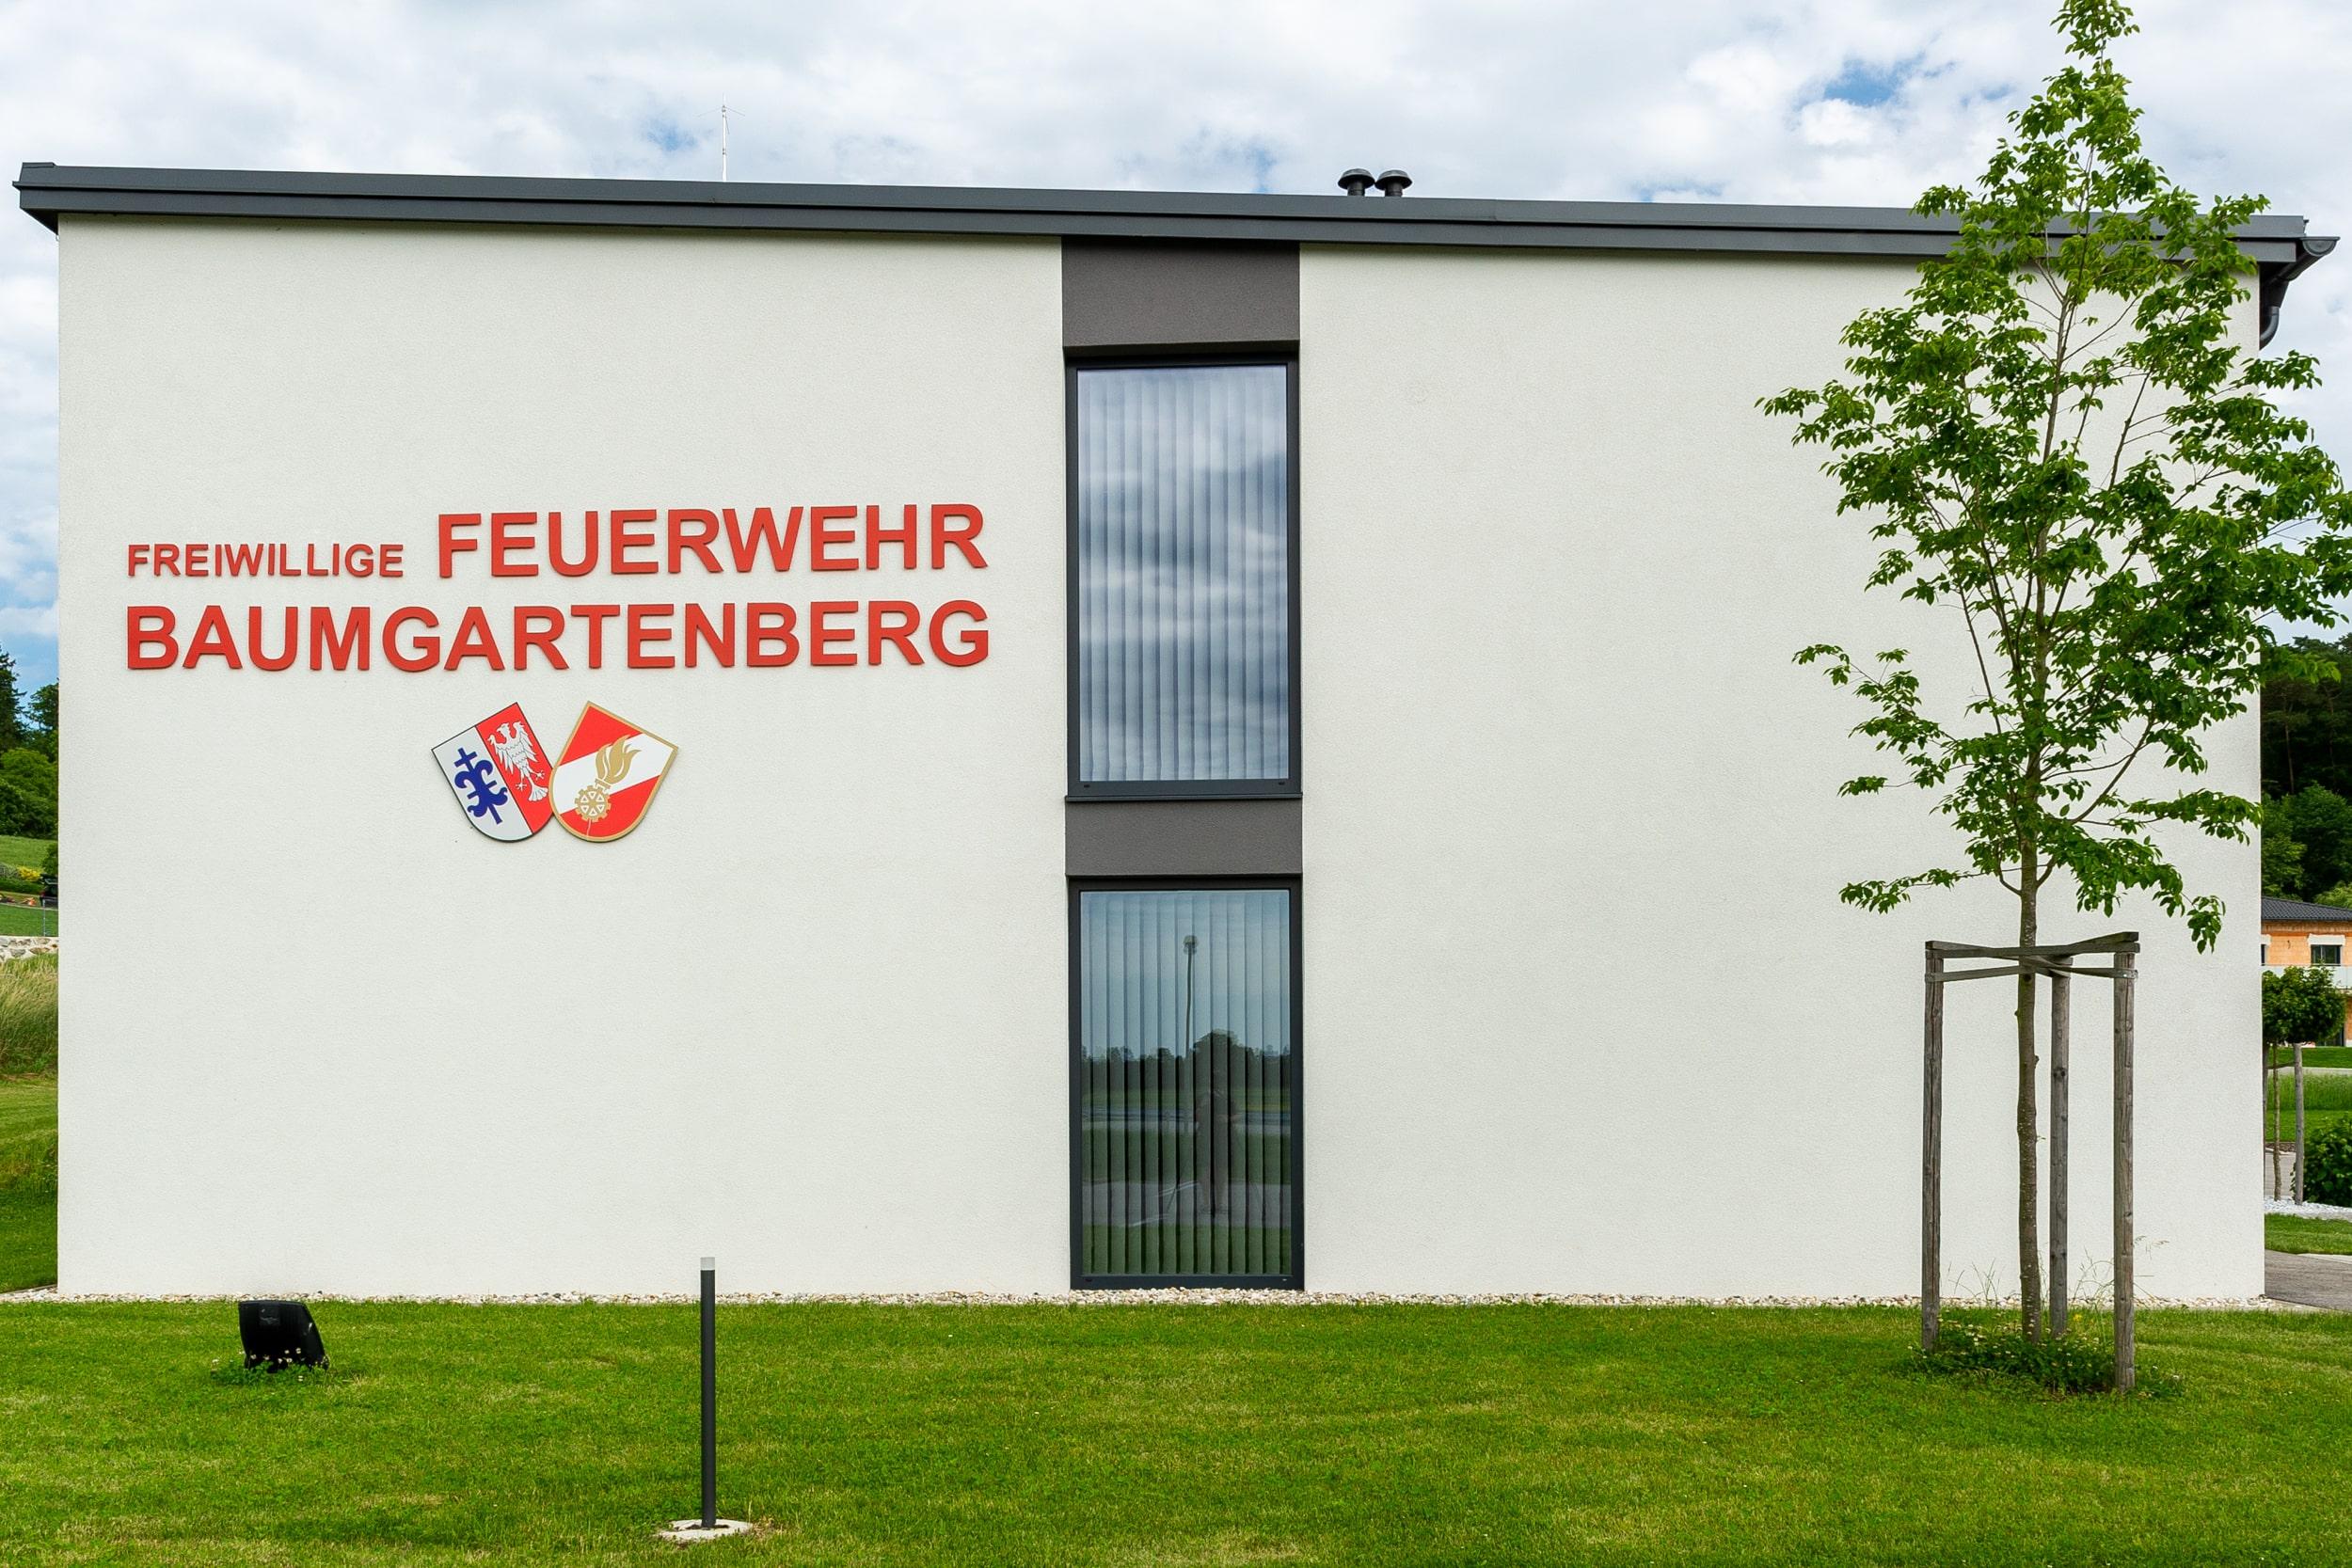 Feuerwehrhaus Baumgartenberg (Westen)